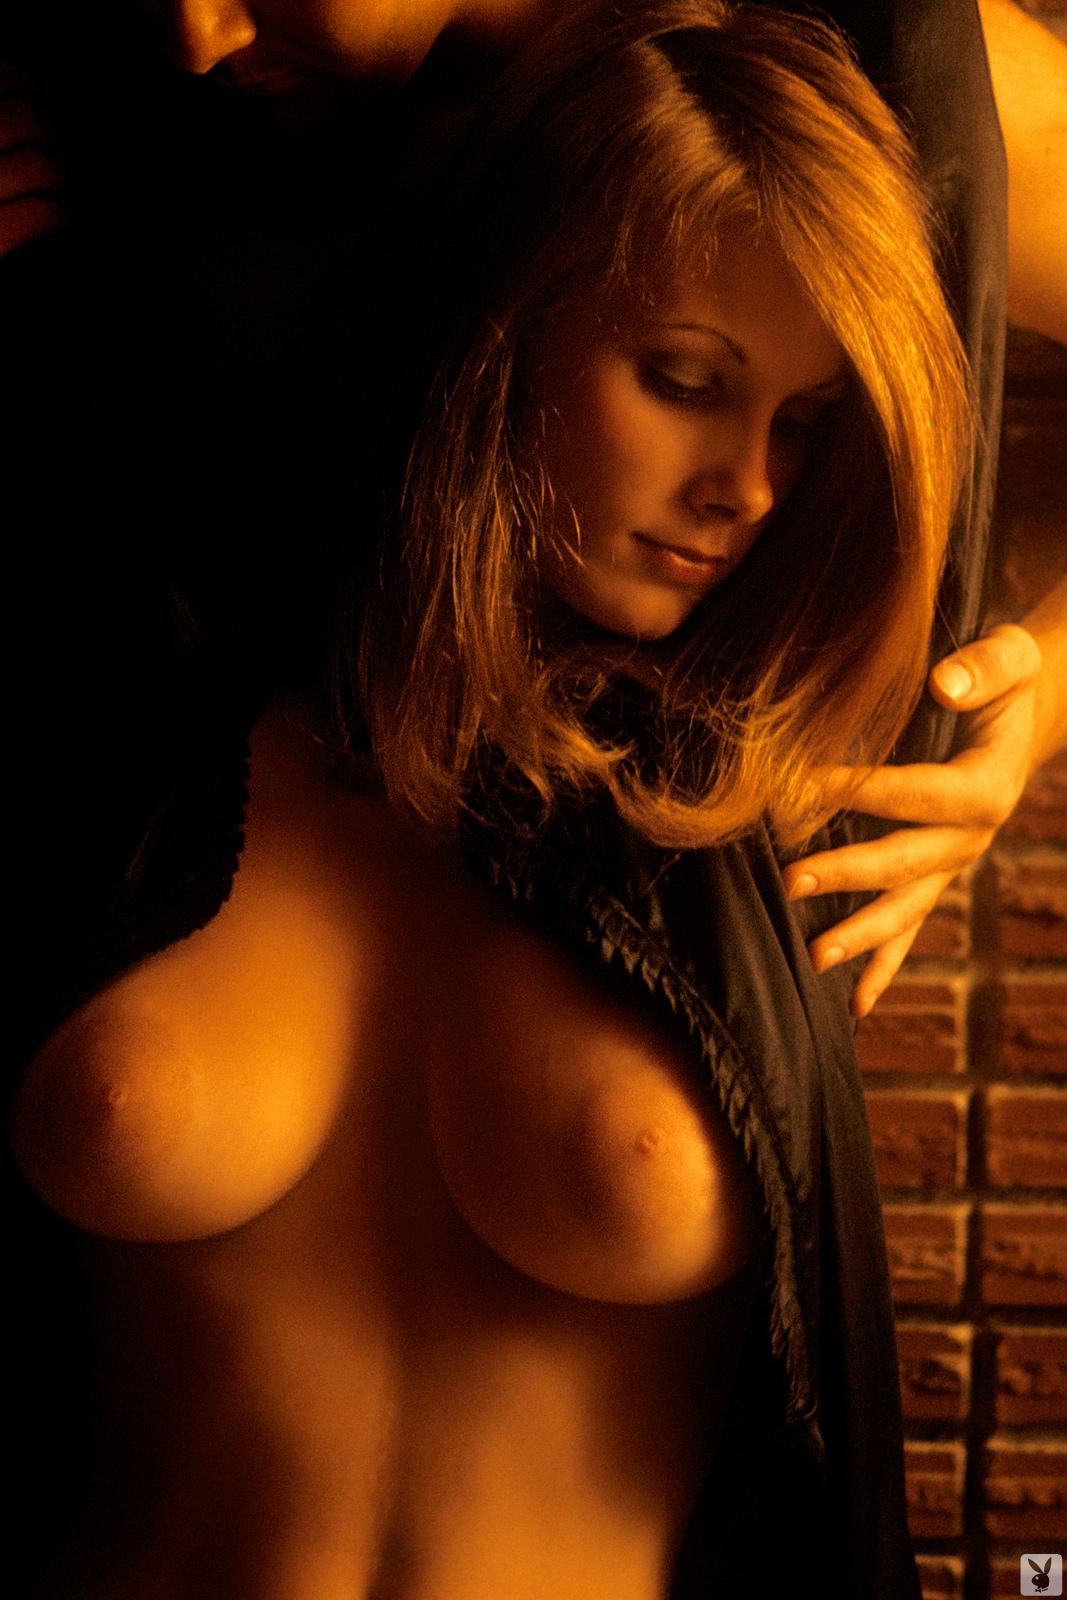 Playboy playmate nancy cameron